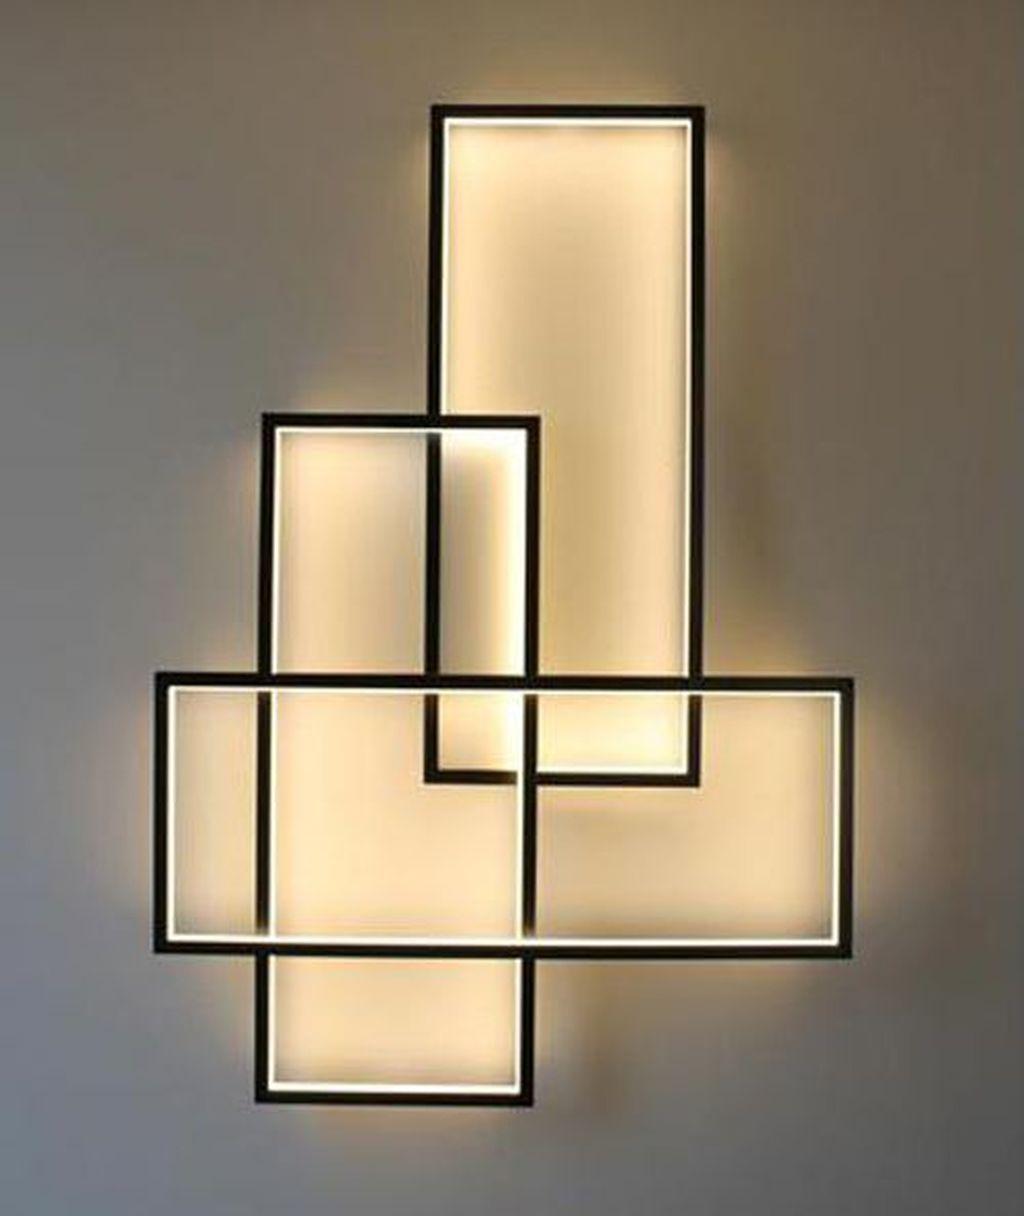 50 Simply Wall Led Lighting Designs Home Decor Decorating Farmhouse Exterior Ideas Bathro Led Light Design Interior Led Lights Wall Mount Light Fixture